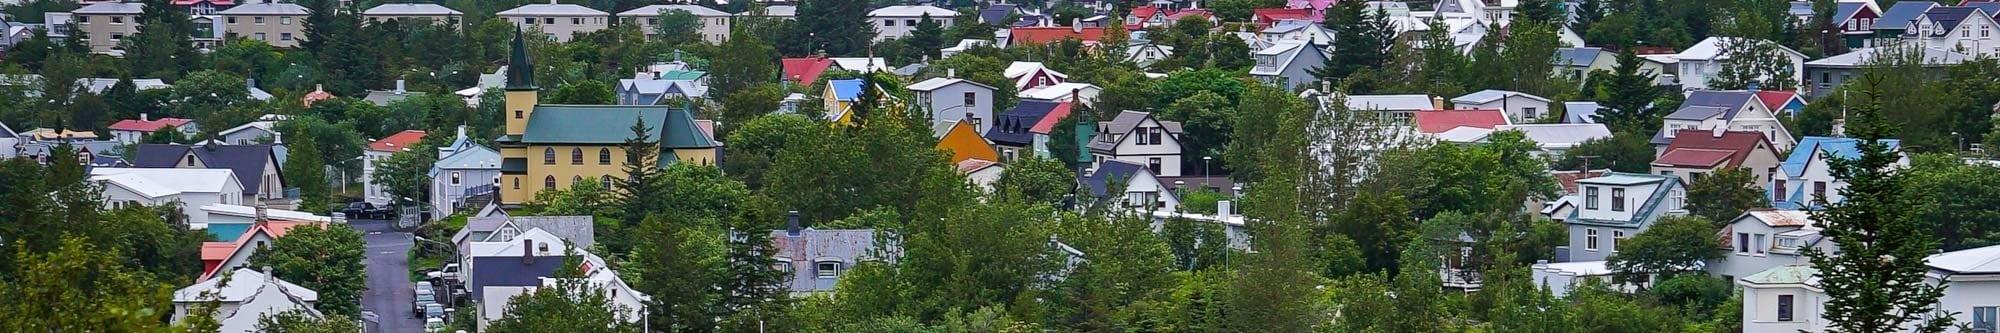 Hafnarfjordur Town in Iceland